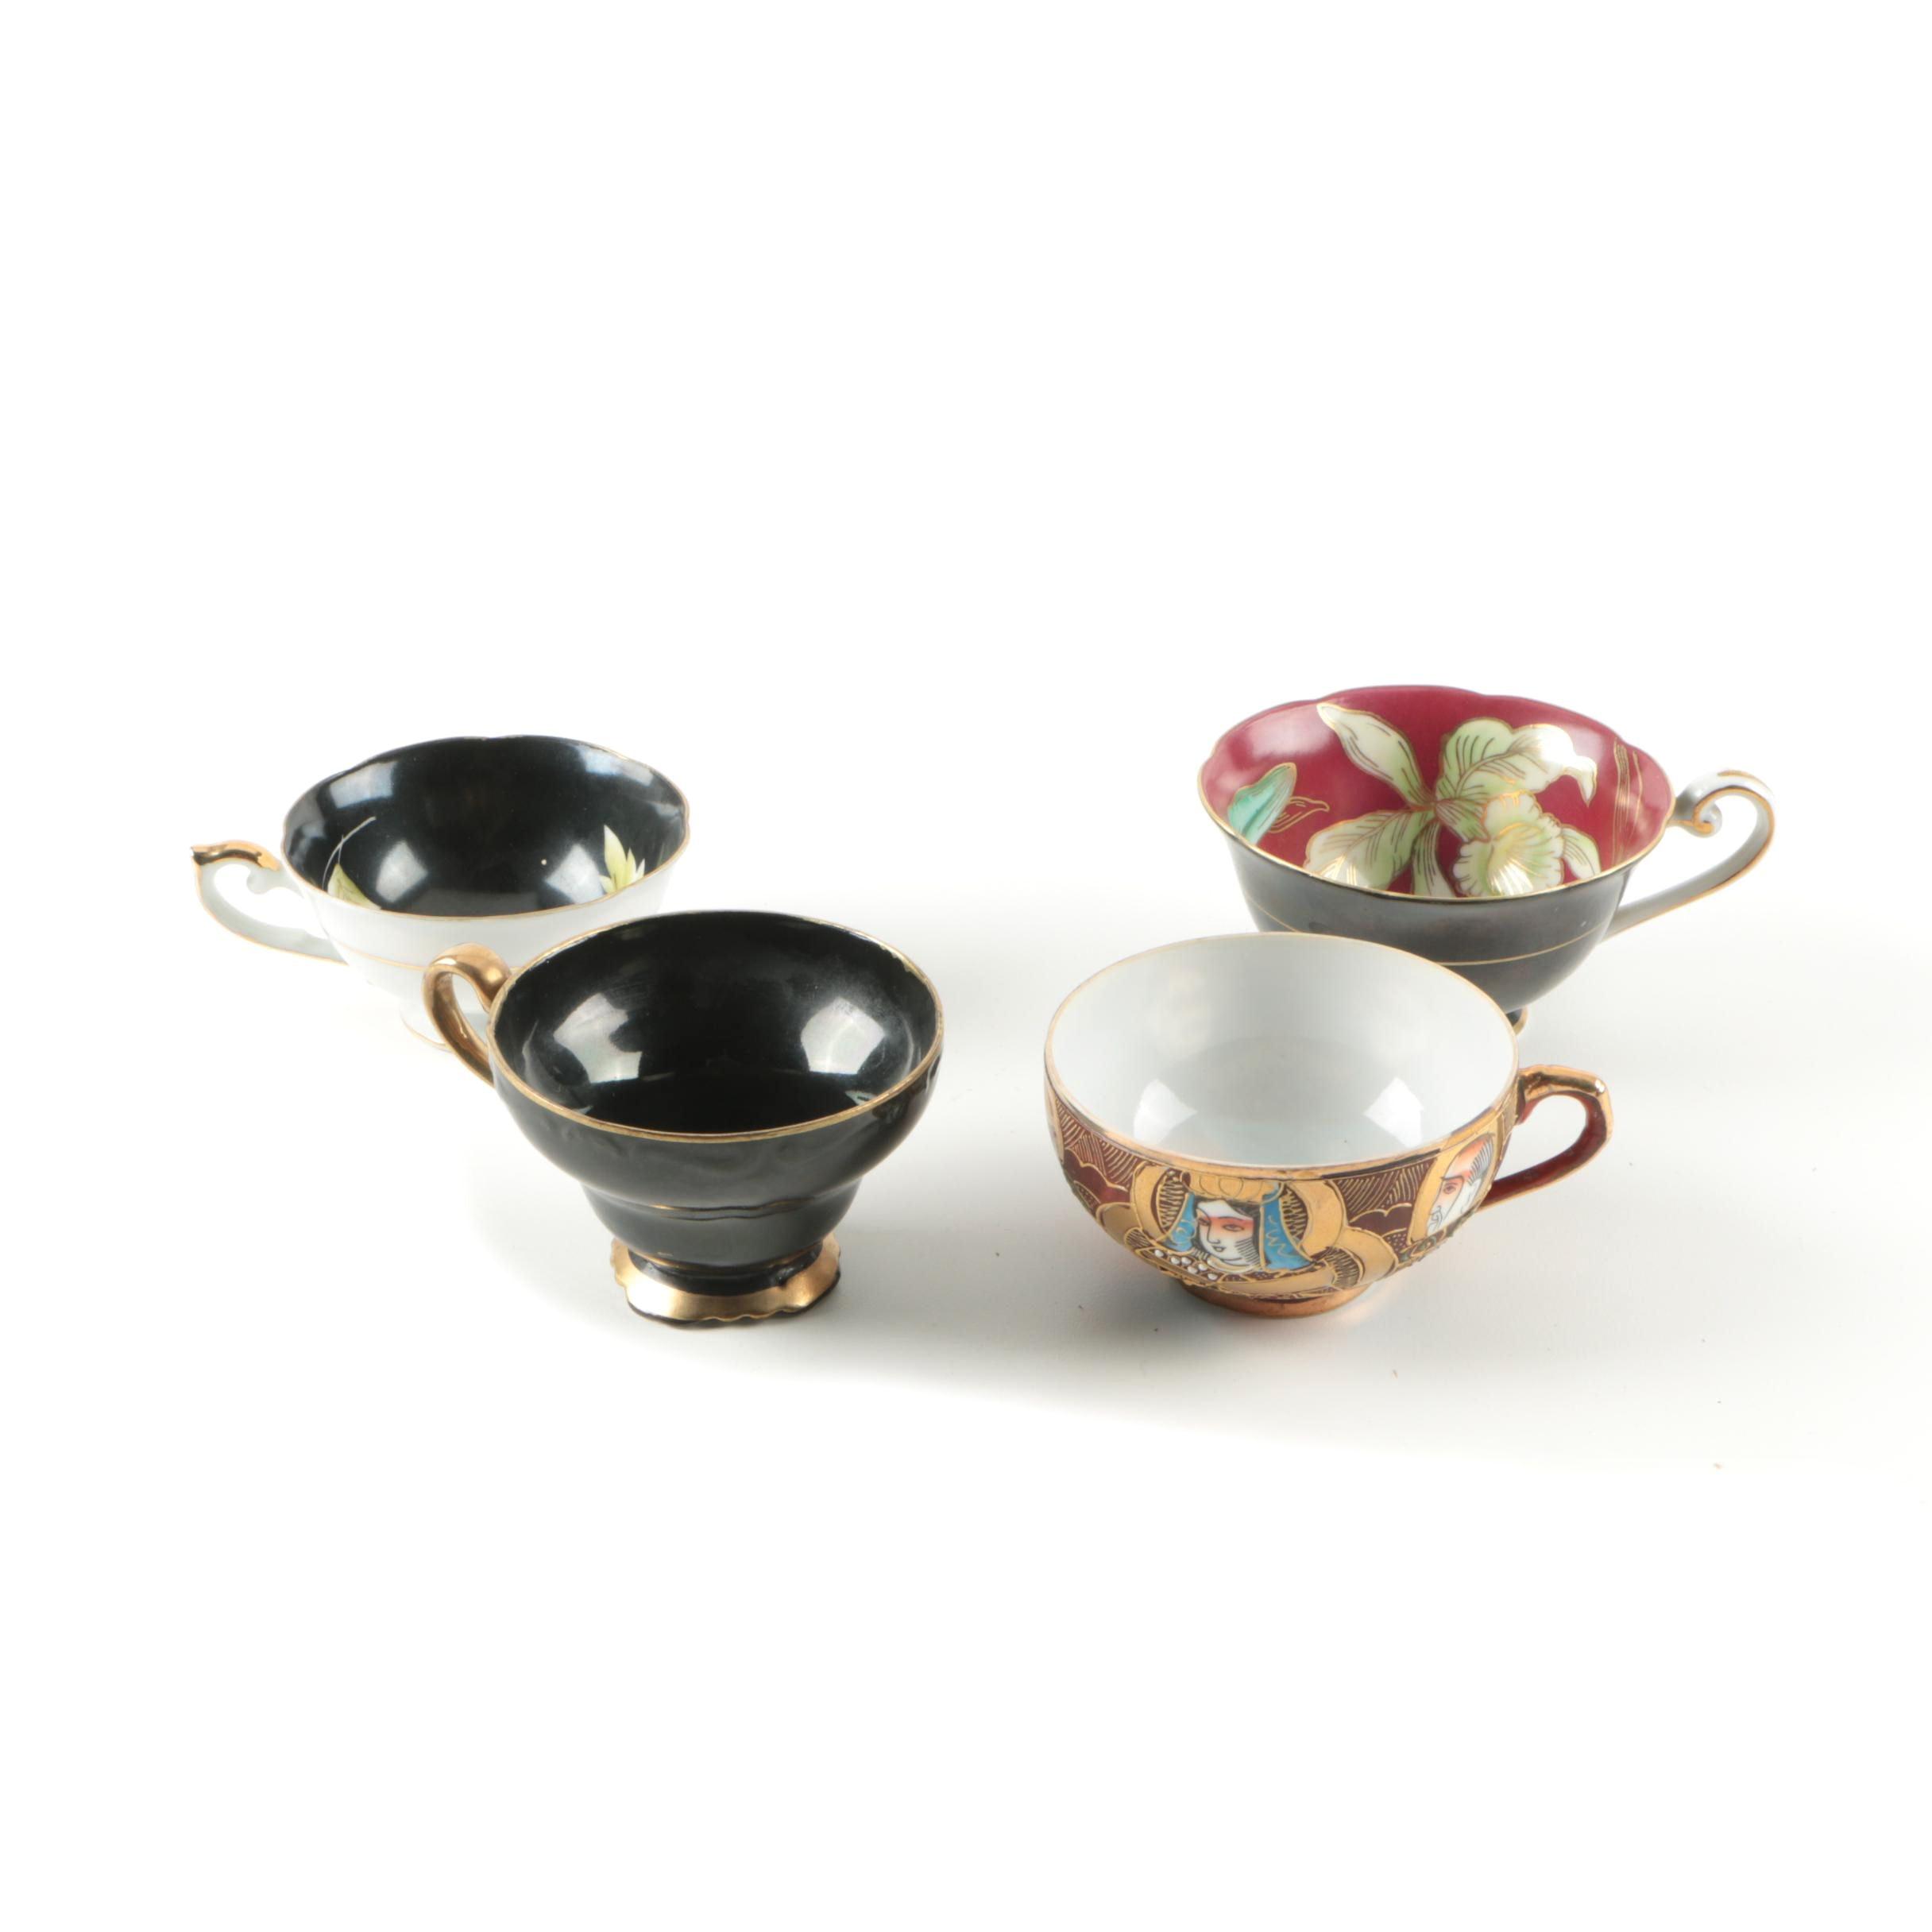 Vintage Lithopane Teacup and Other Japanese Teacups